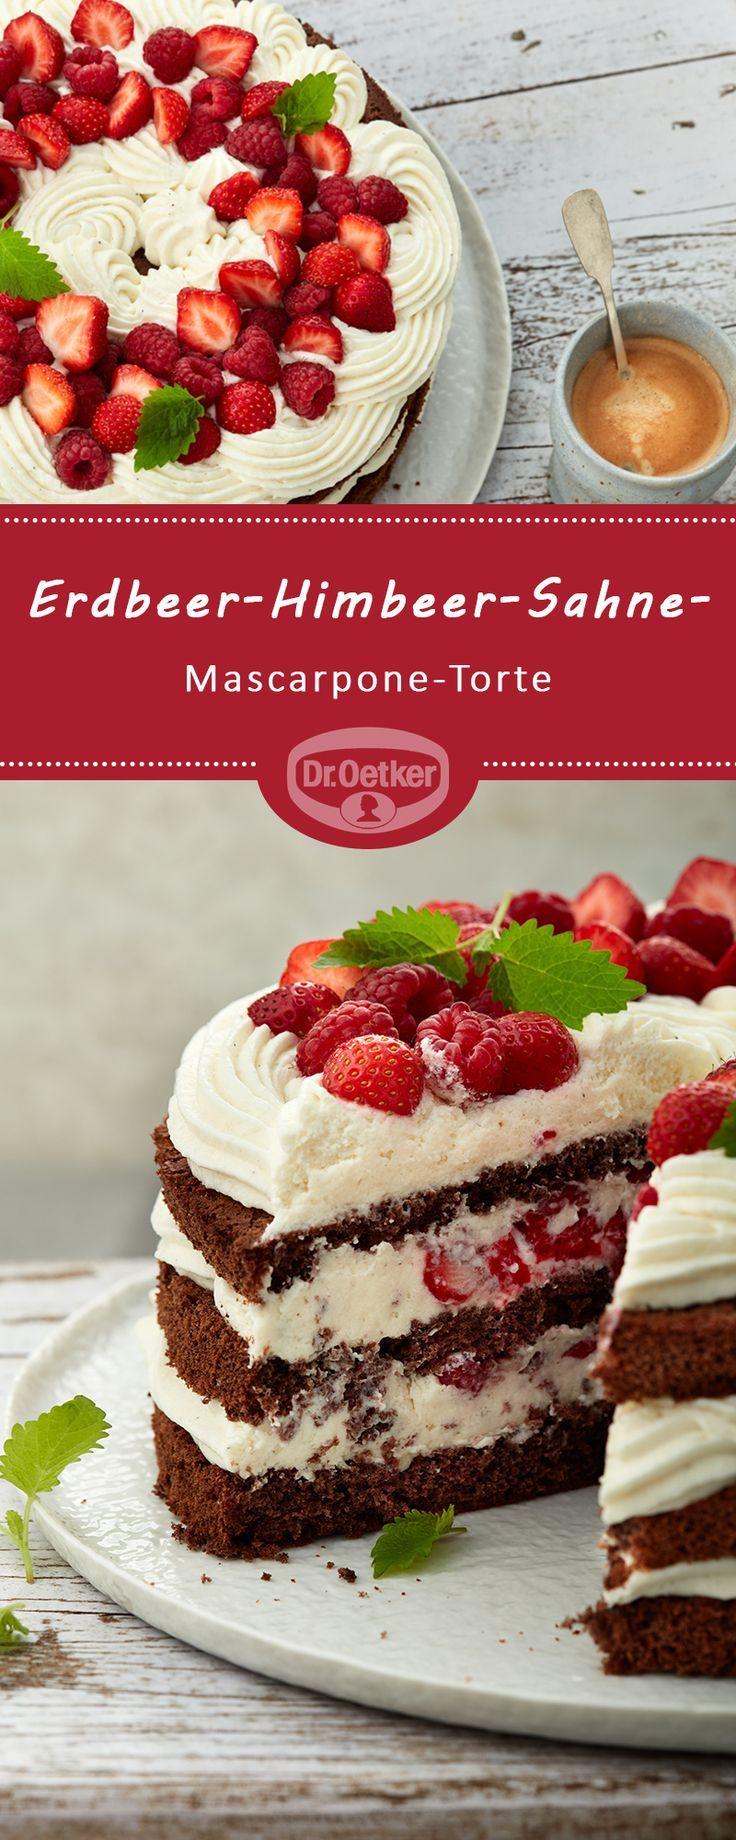 Erdbeer-Himbeer-Sahne-Mascarpone-Kuchen